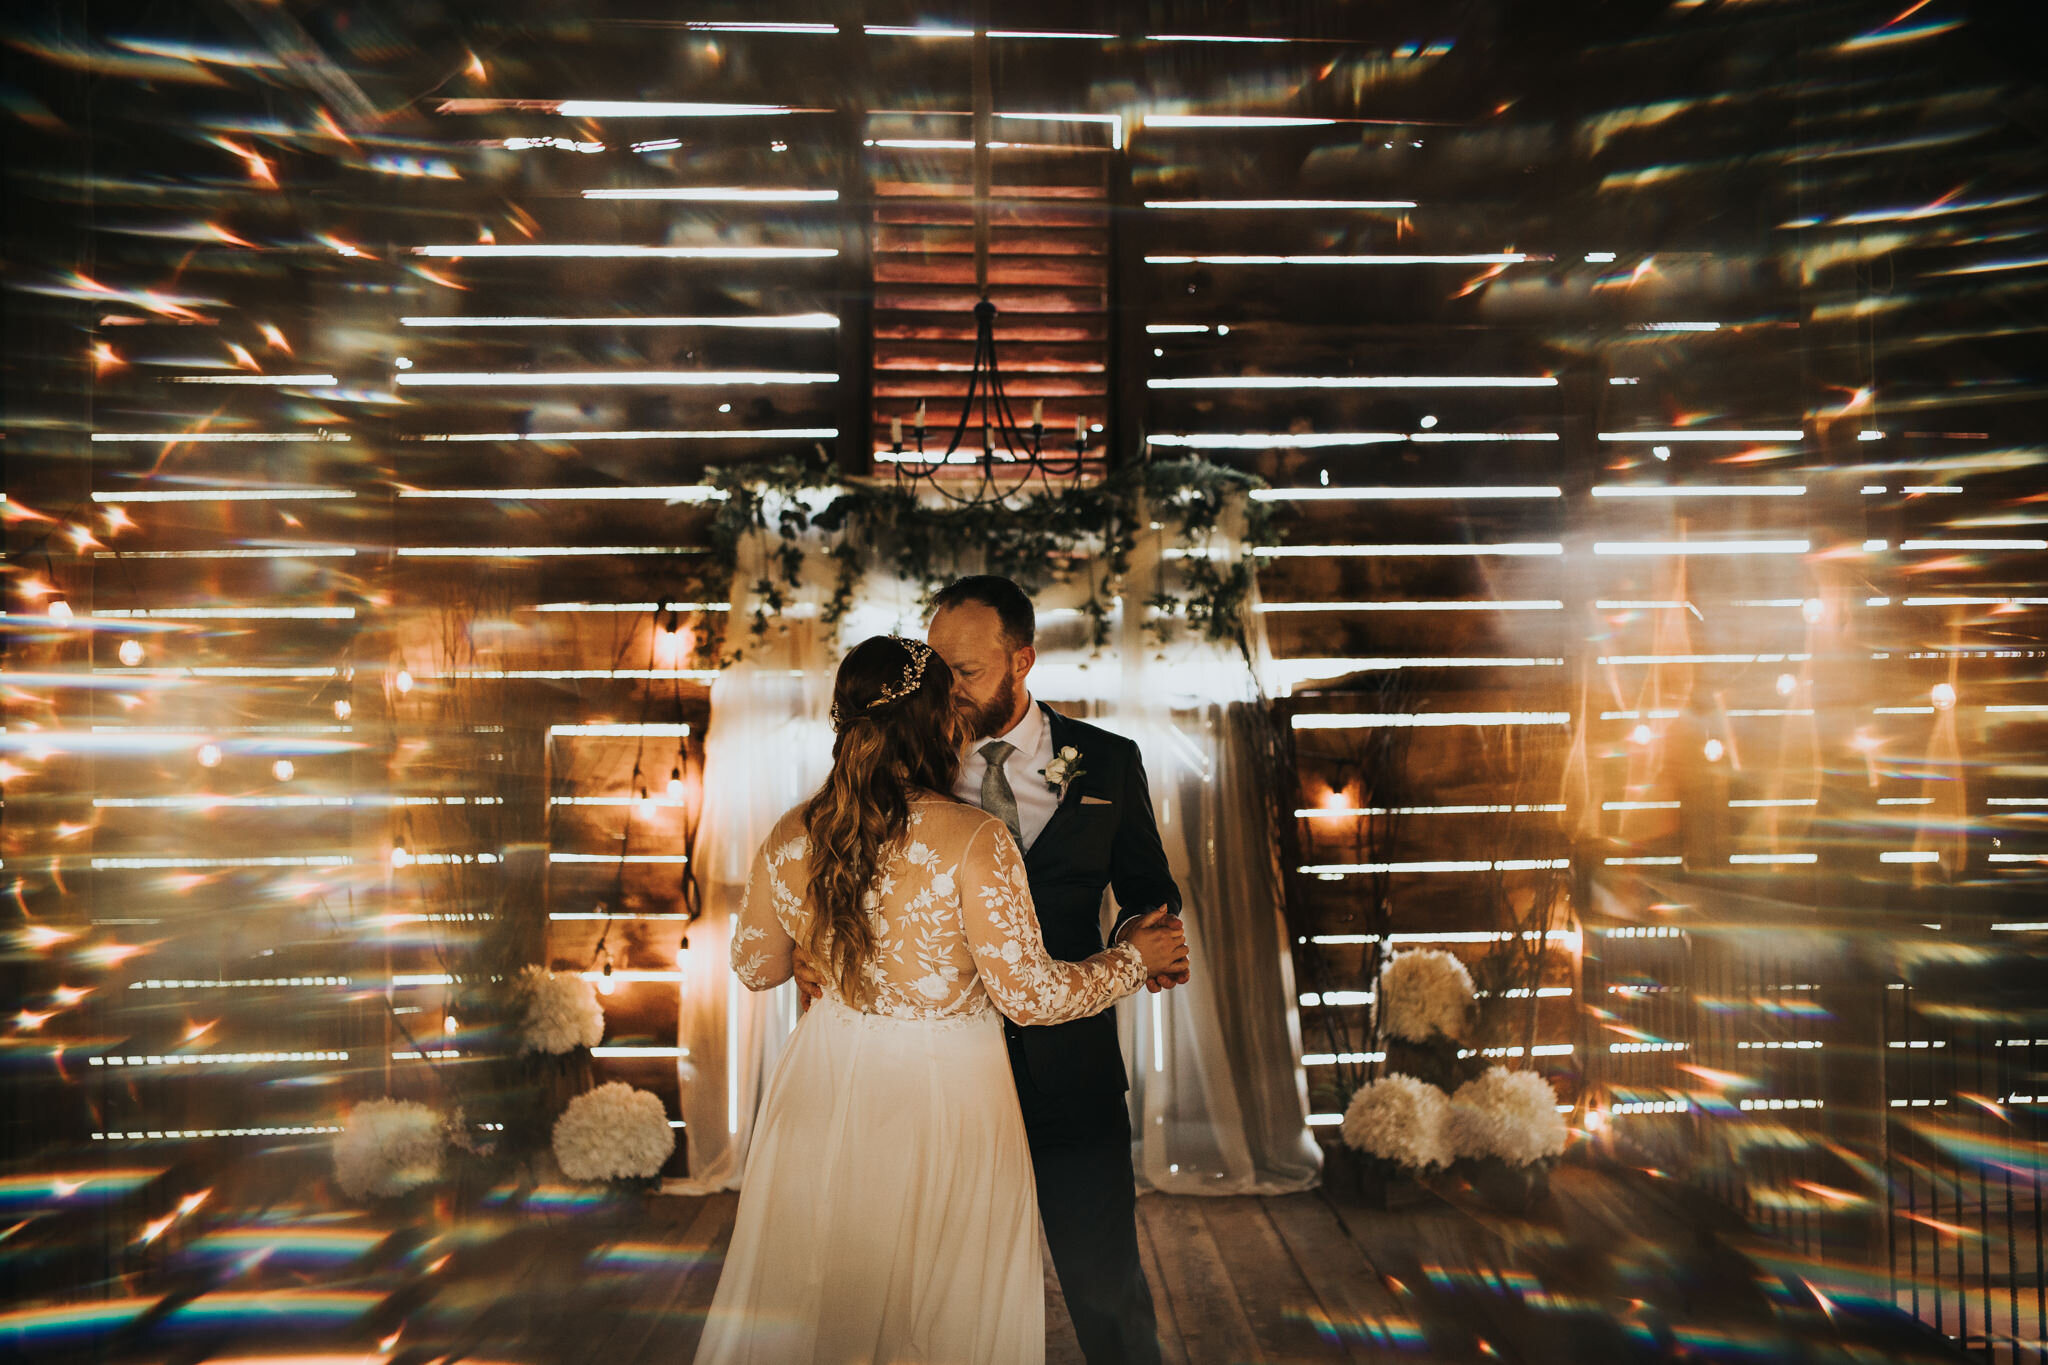 KateMatt-North-Georgia-Wedding-Photographer-Mountain-Laurel-Farm-118.jpg